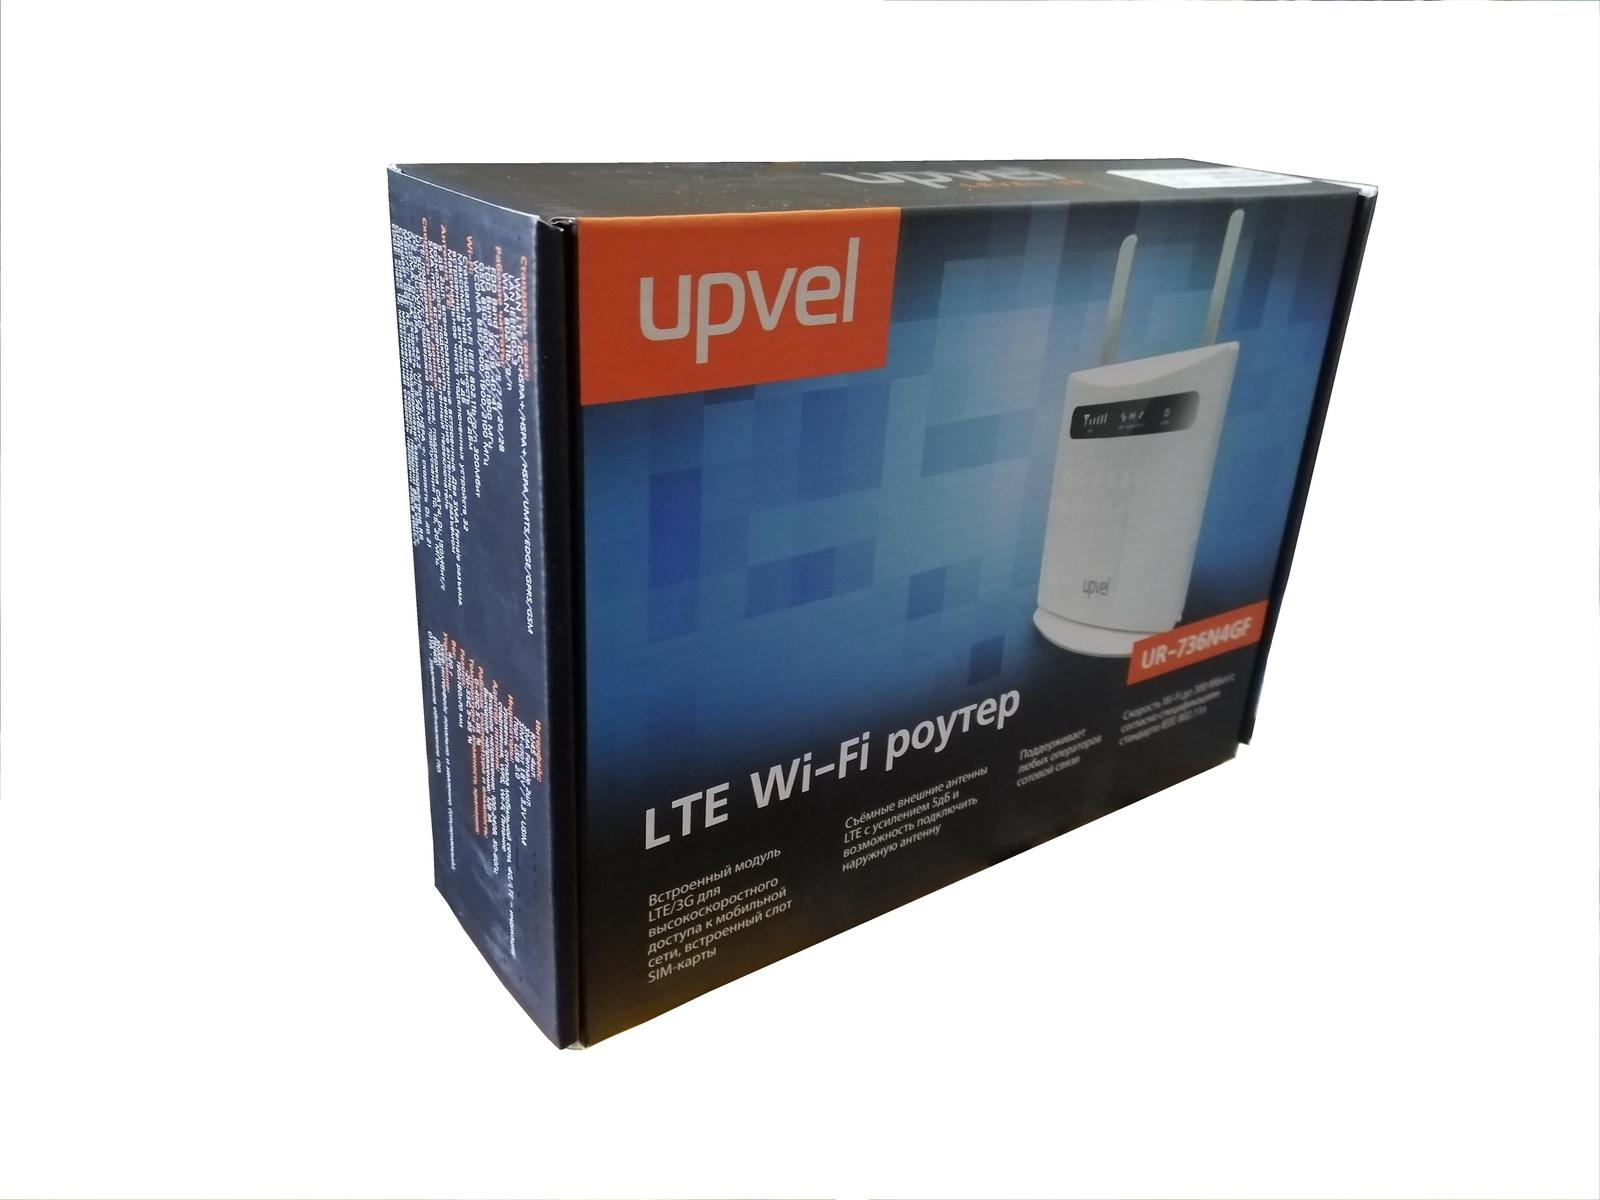 UPVEL UR-736N4GF 3G/4G/LTE Wi-Fi роутер стандарта 802.11n 300 Мбит/с unlock wireless sierra aircard 760s telstra 4g lte modem router w sim card slot